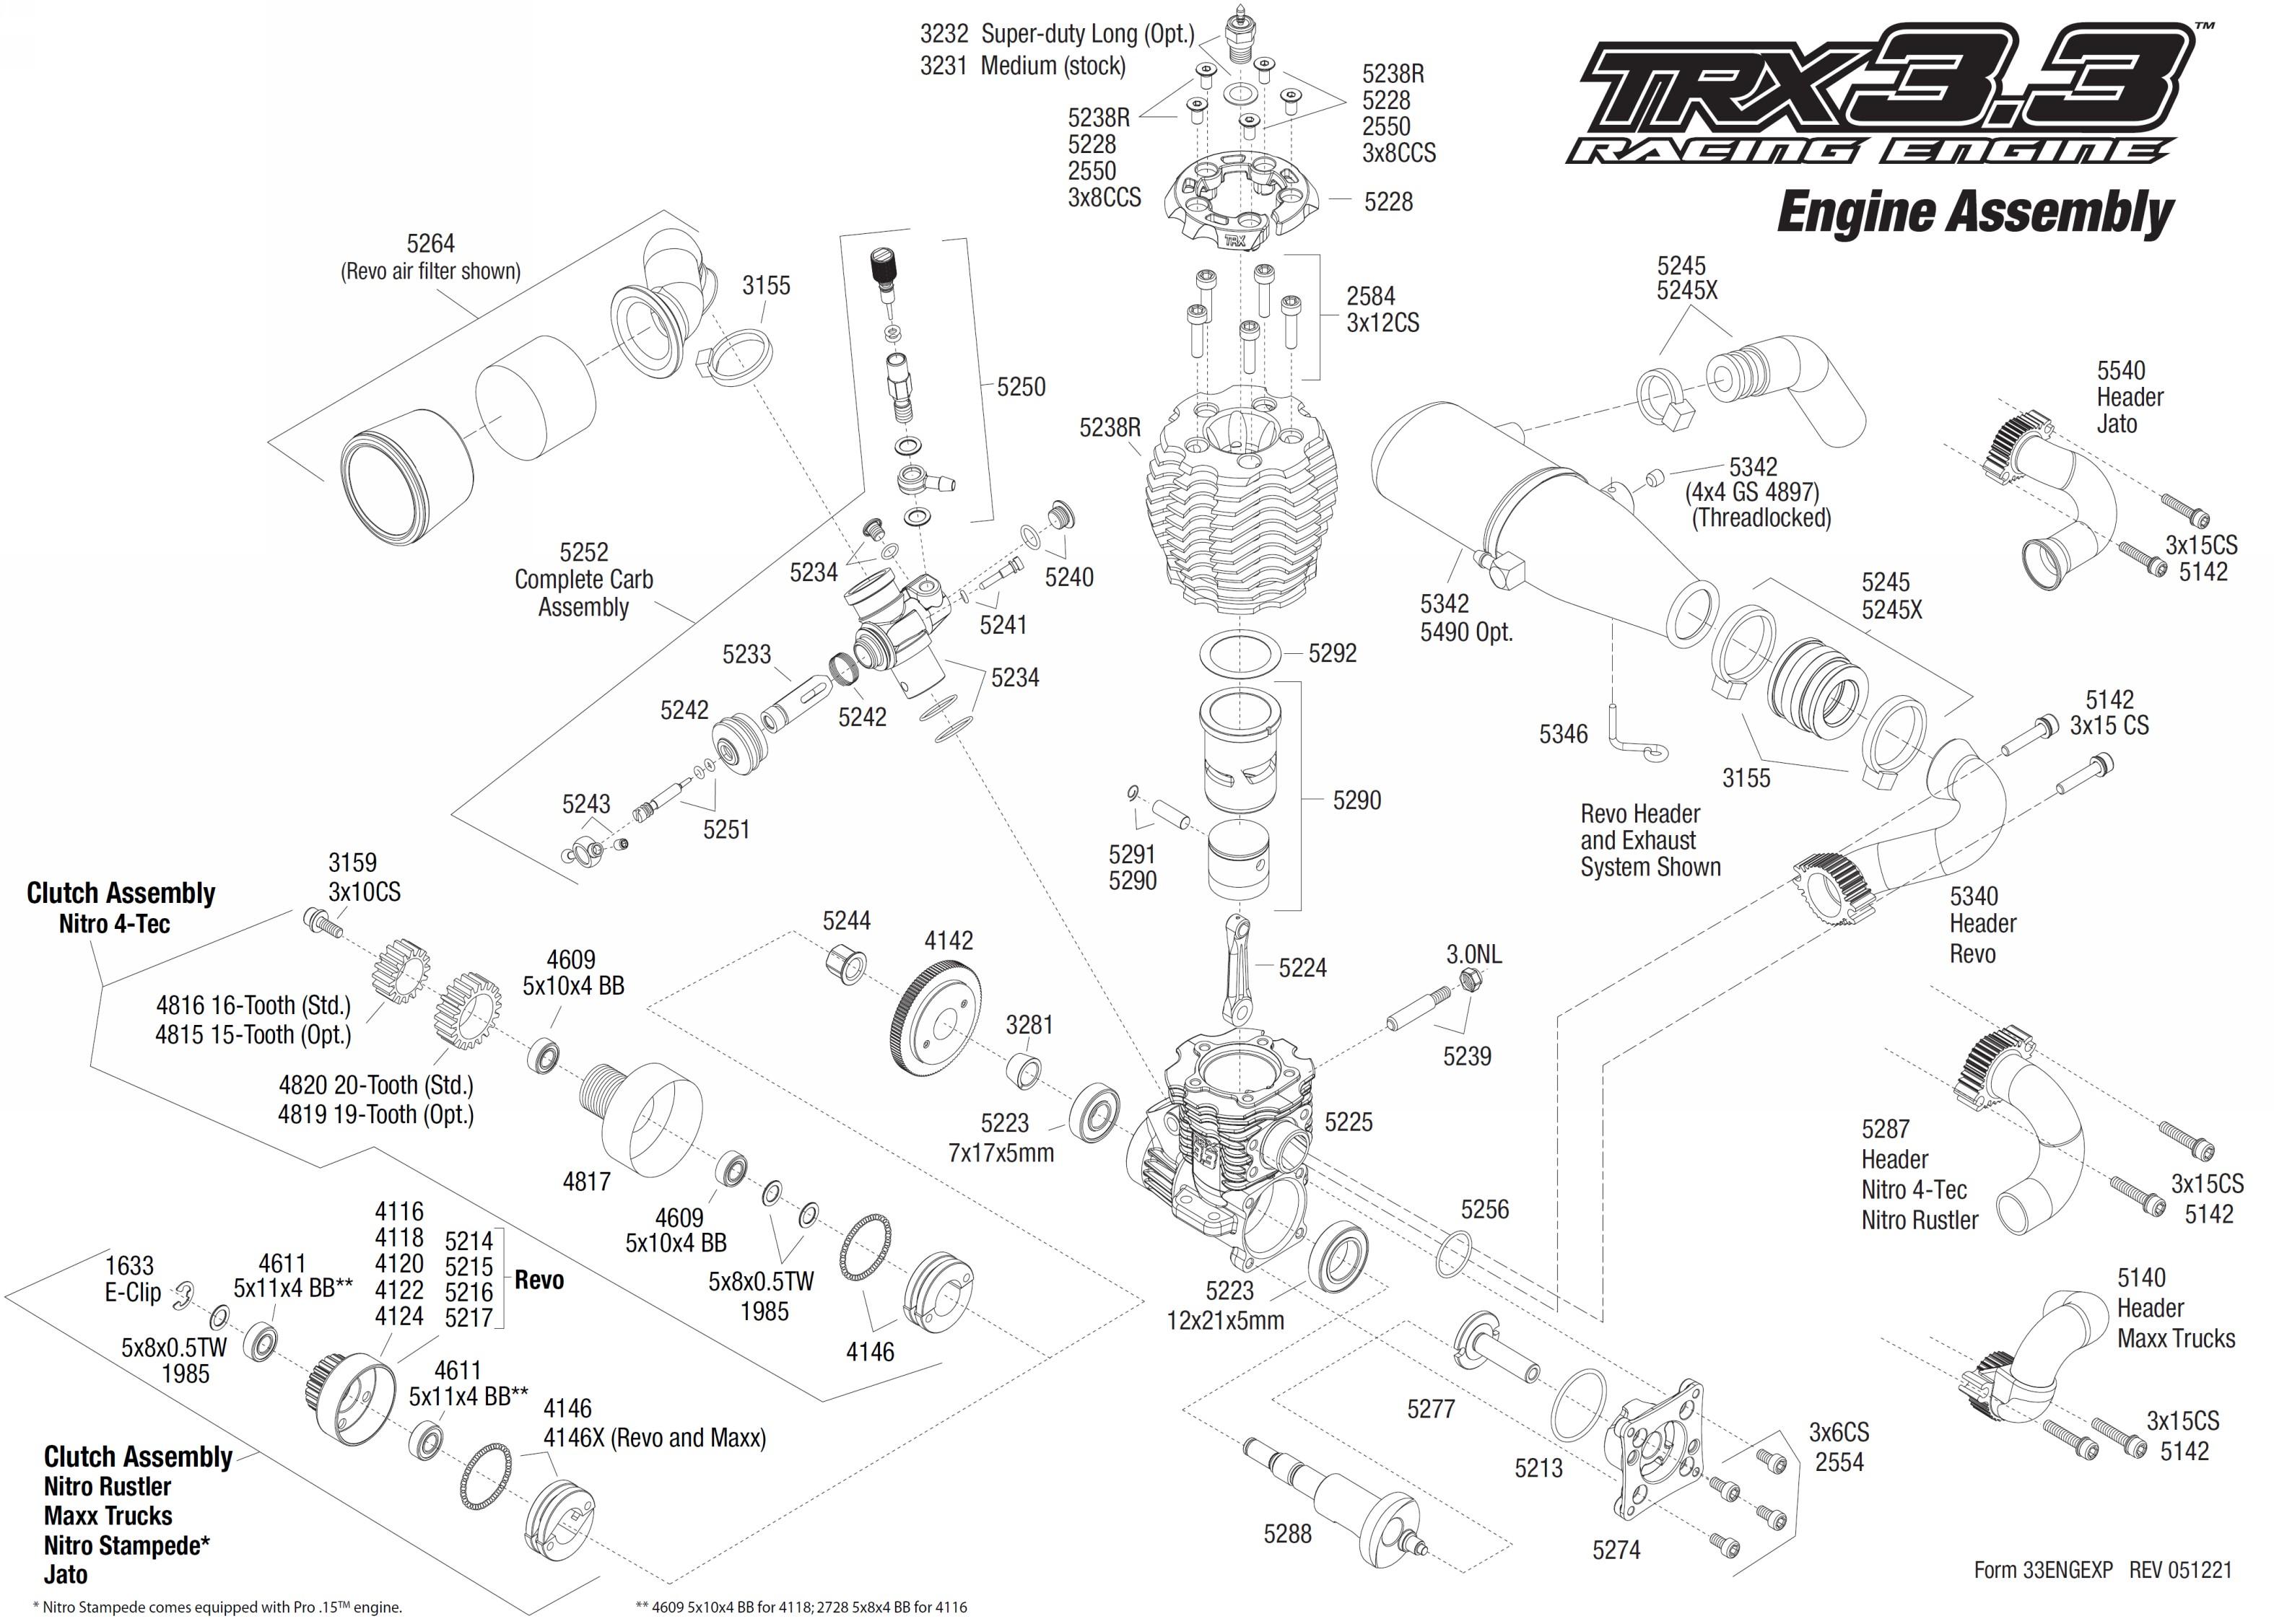 Mazda E Wiring Diagram Torzone Org. Mazda. Auto Wiring Diagram